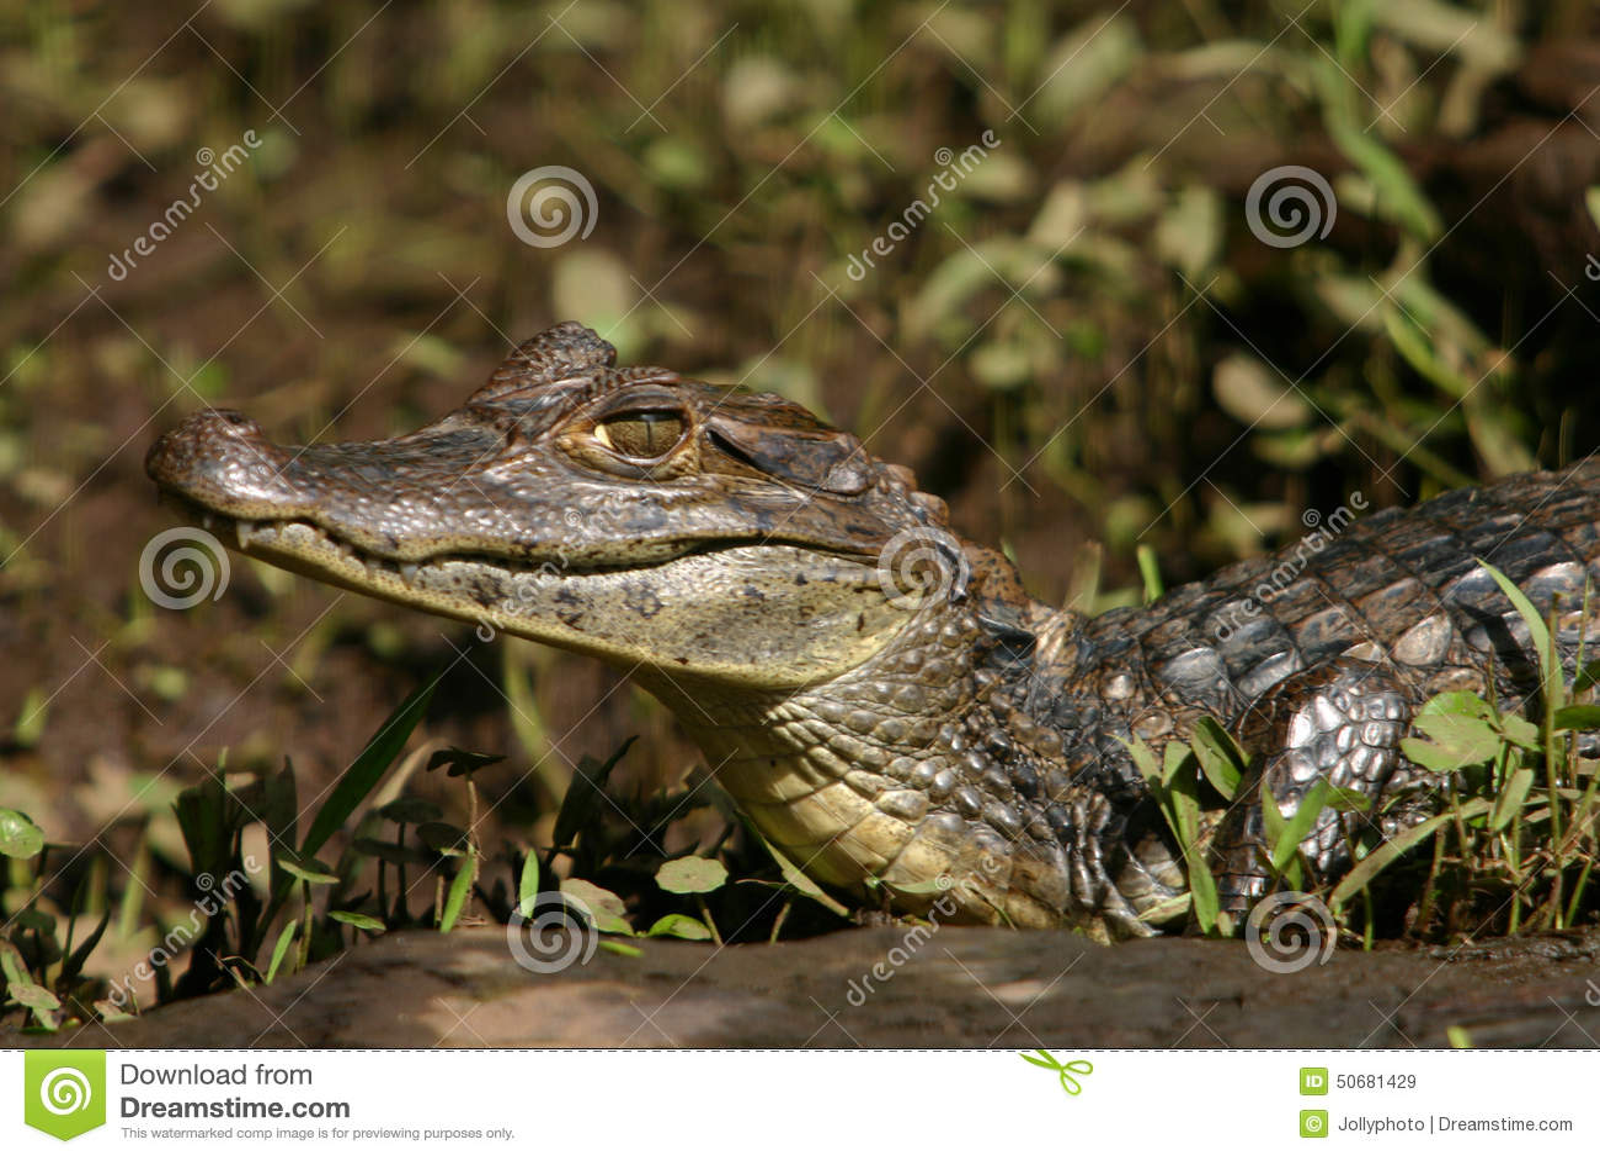 Download 凯门鳄Gator3 库存图片. 图片 包括有 前面, 平稳, 肋前缘, 尼日尔, rica, 中央, 亚马逊 - 50681429